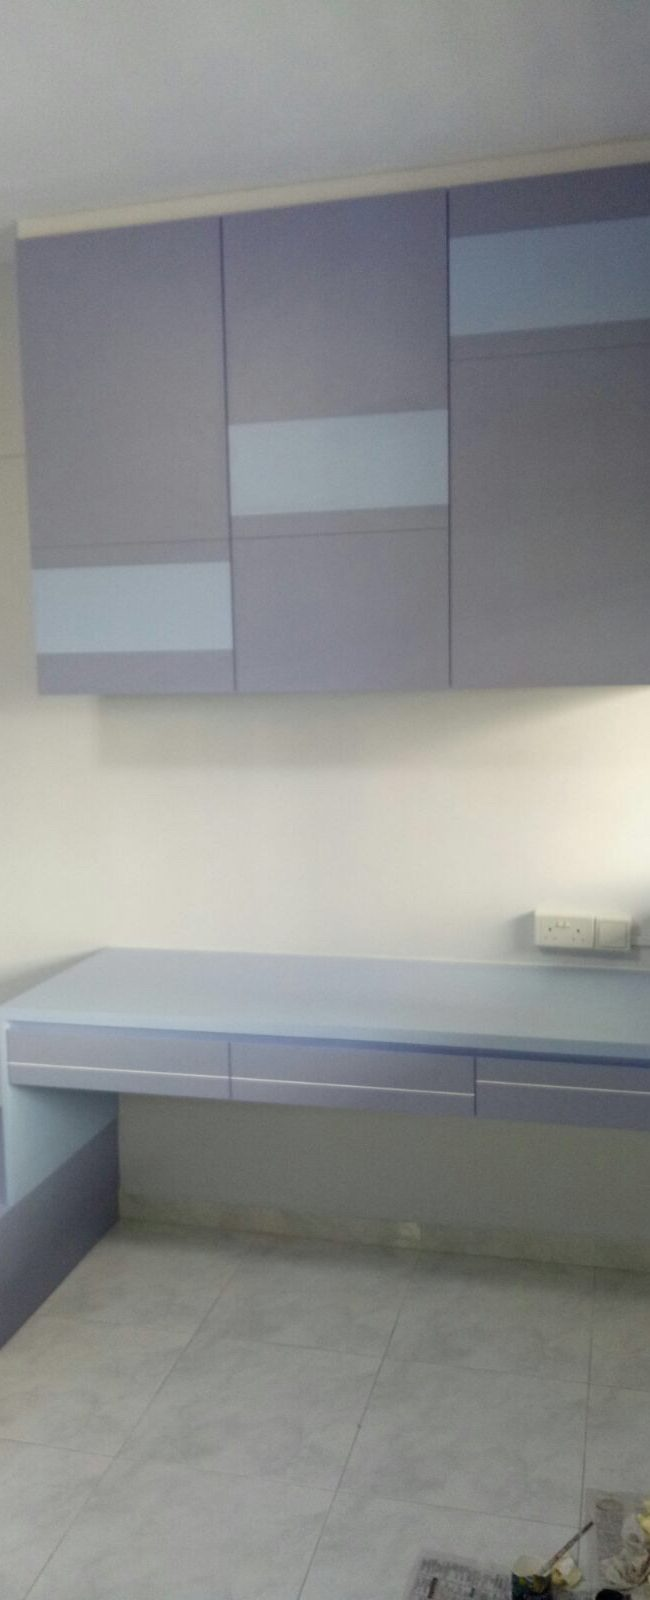 Jurong East Project – Combination of Closet & Dresser